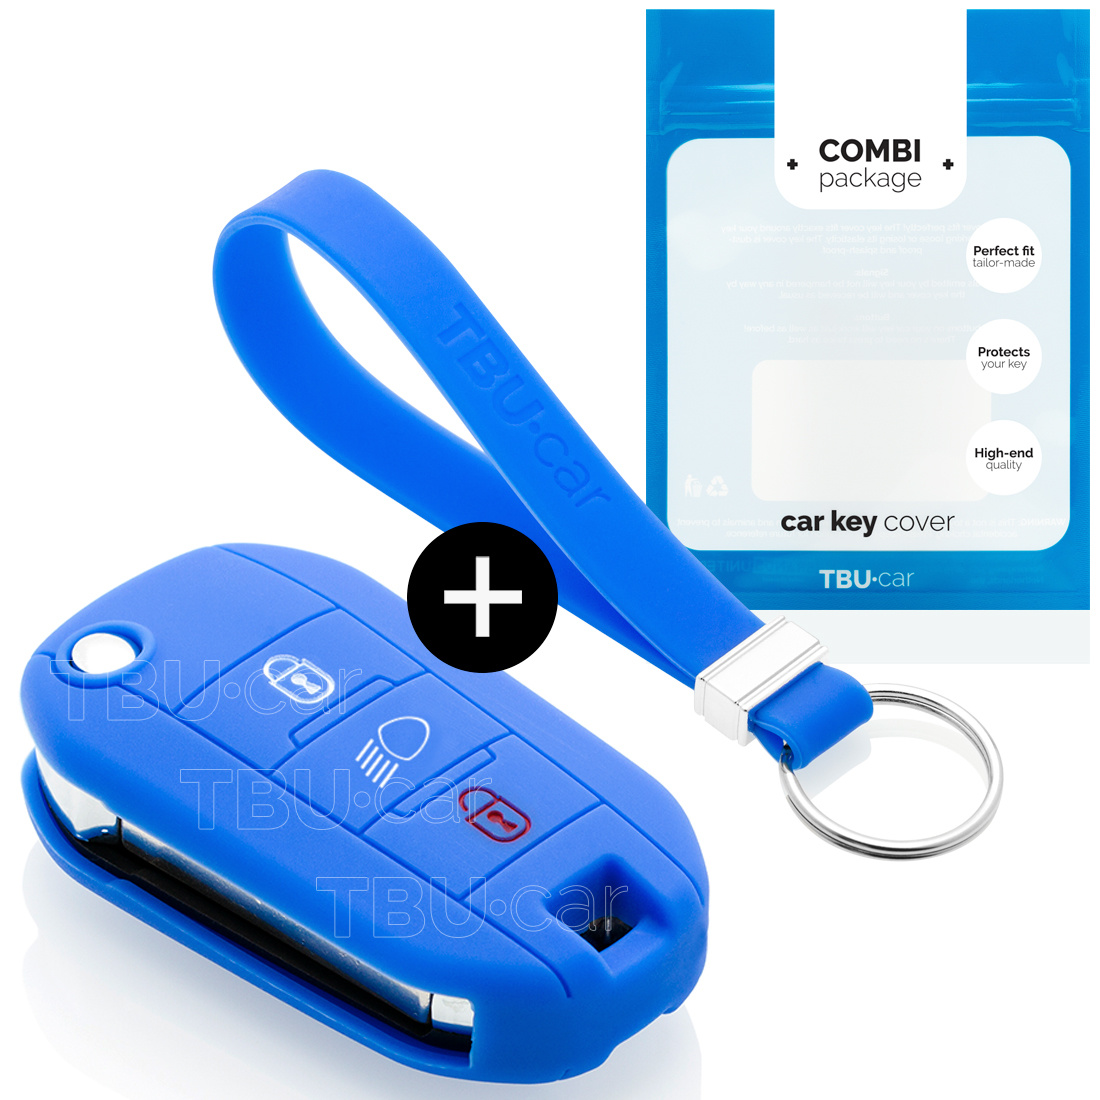 Citroën Autoschlüssel Hülle - Silikon Schutzhülle - Schlüsselhülle Cover - Blau